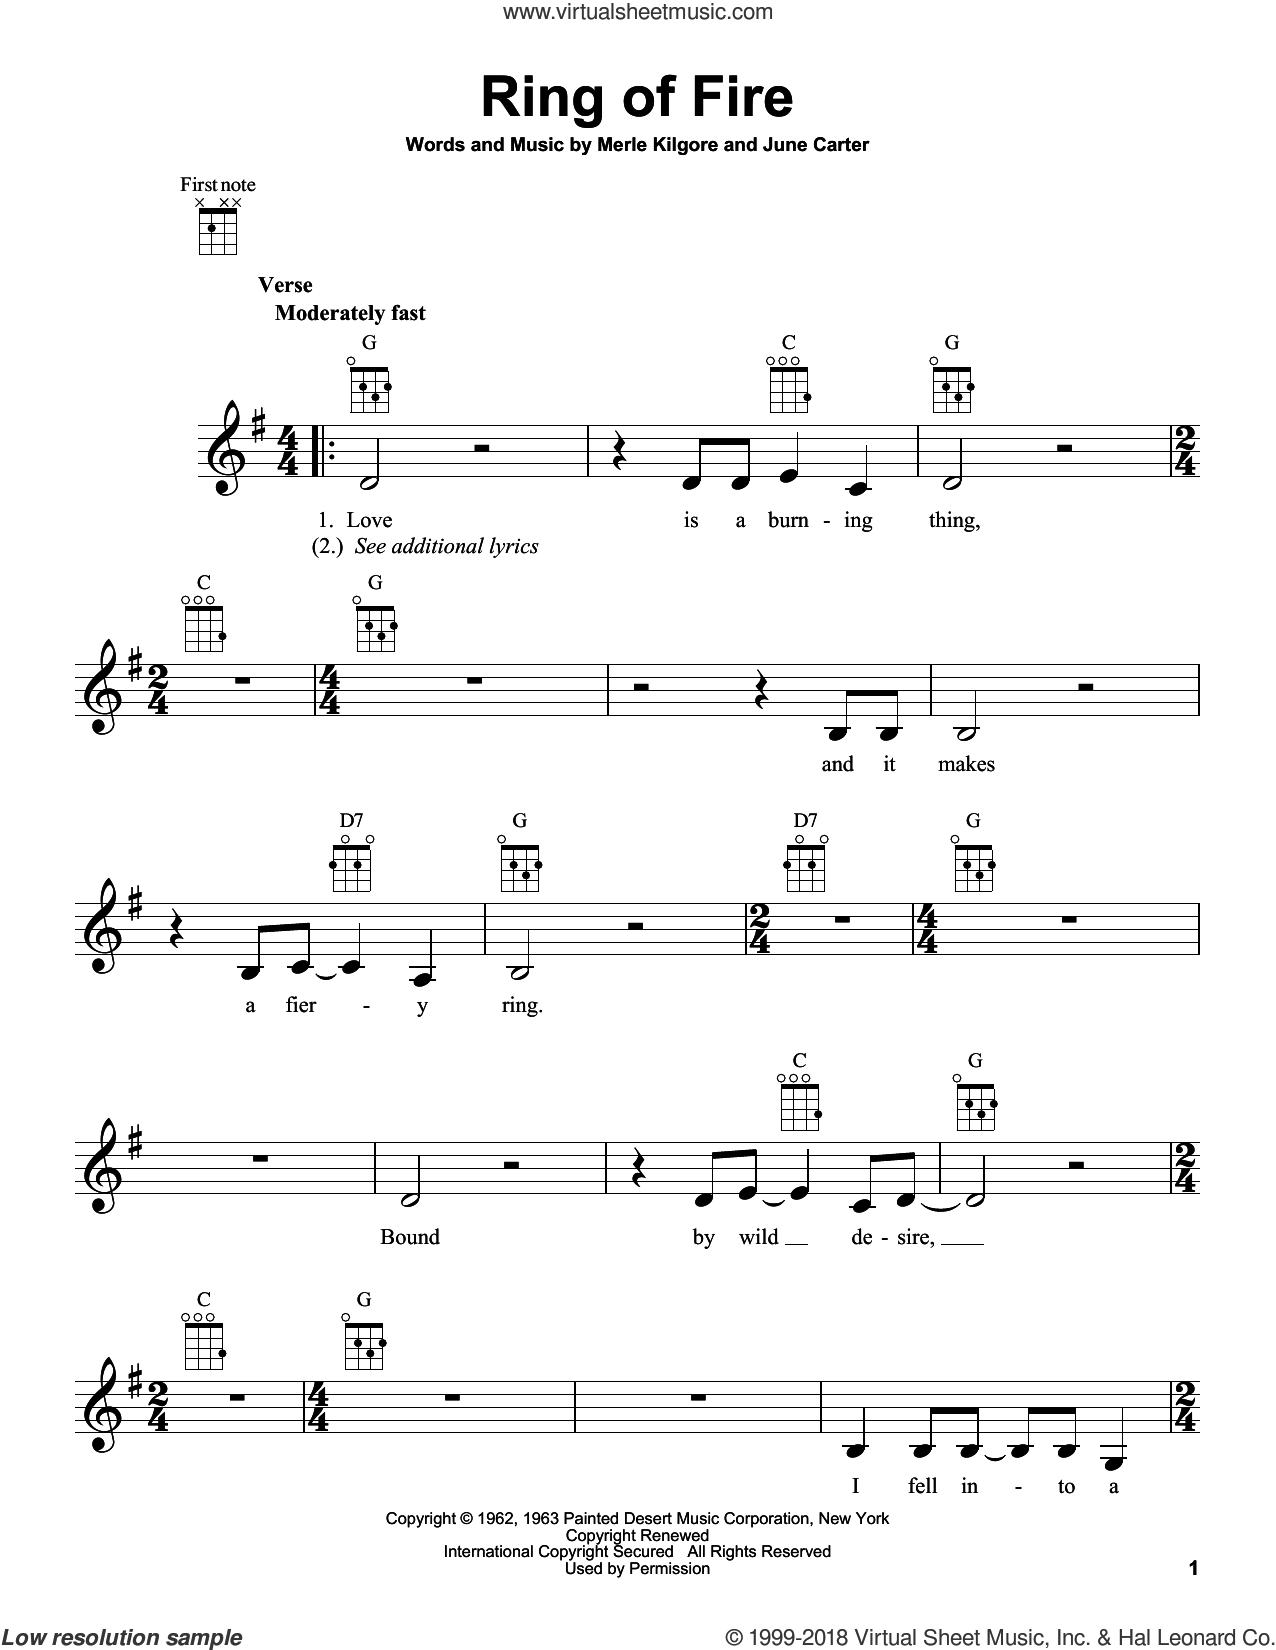 Ring Of Fire sheet music for ukulele by Johnny Cash, Alan Jackson, June Carter and Merle Kilgore, intermediate skill level